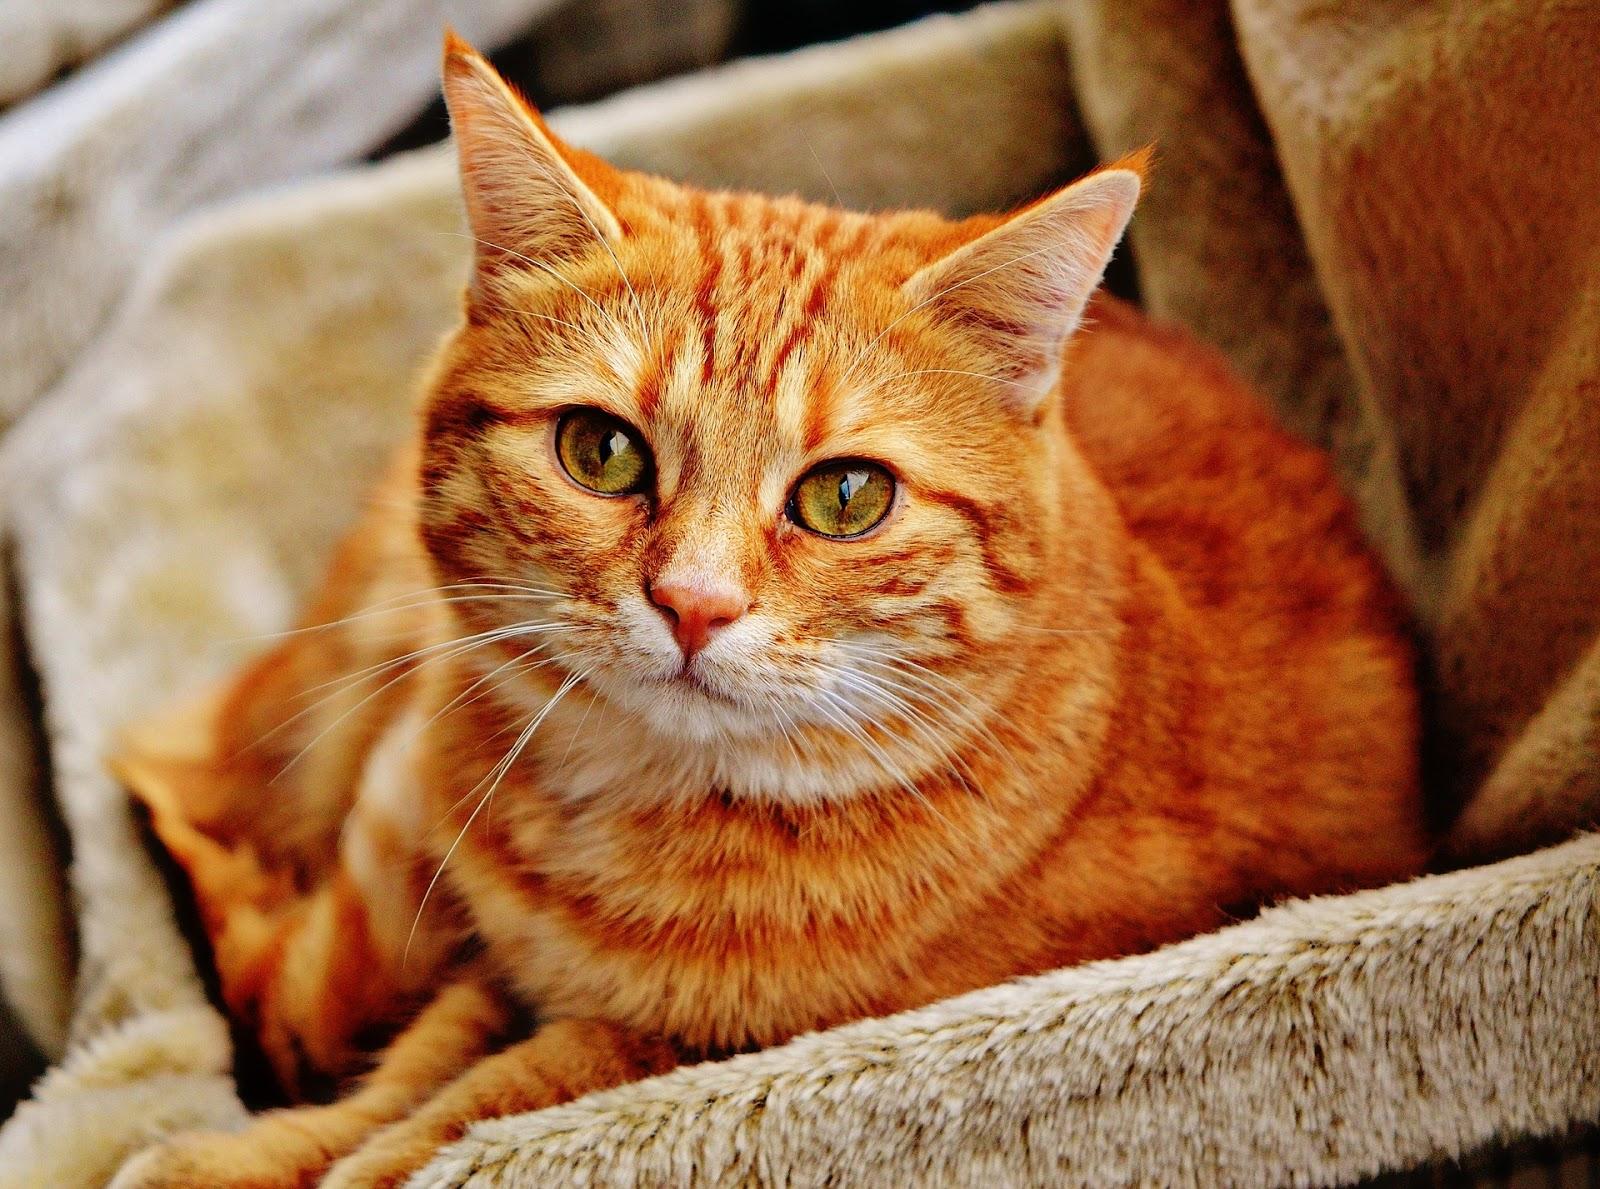 cat-red-mackerel-tiger-cuddly,cat images